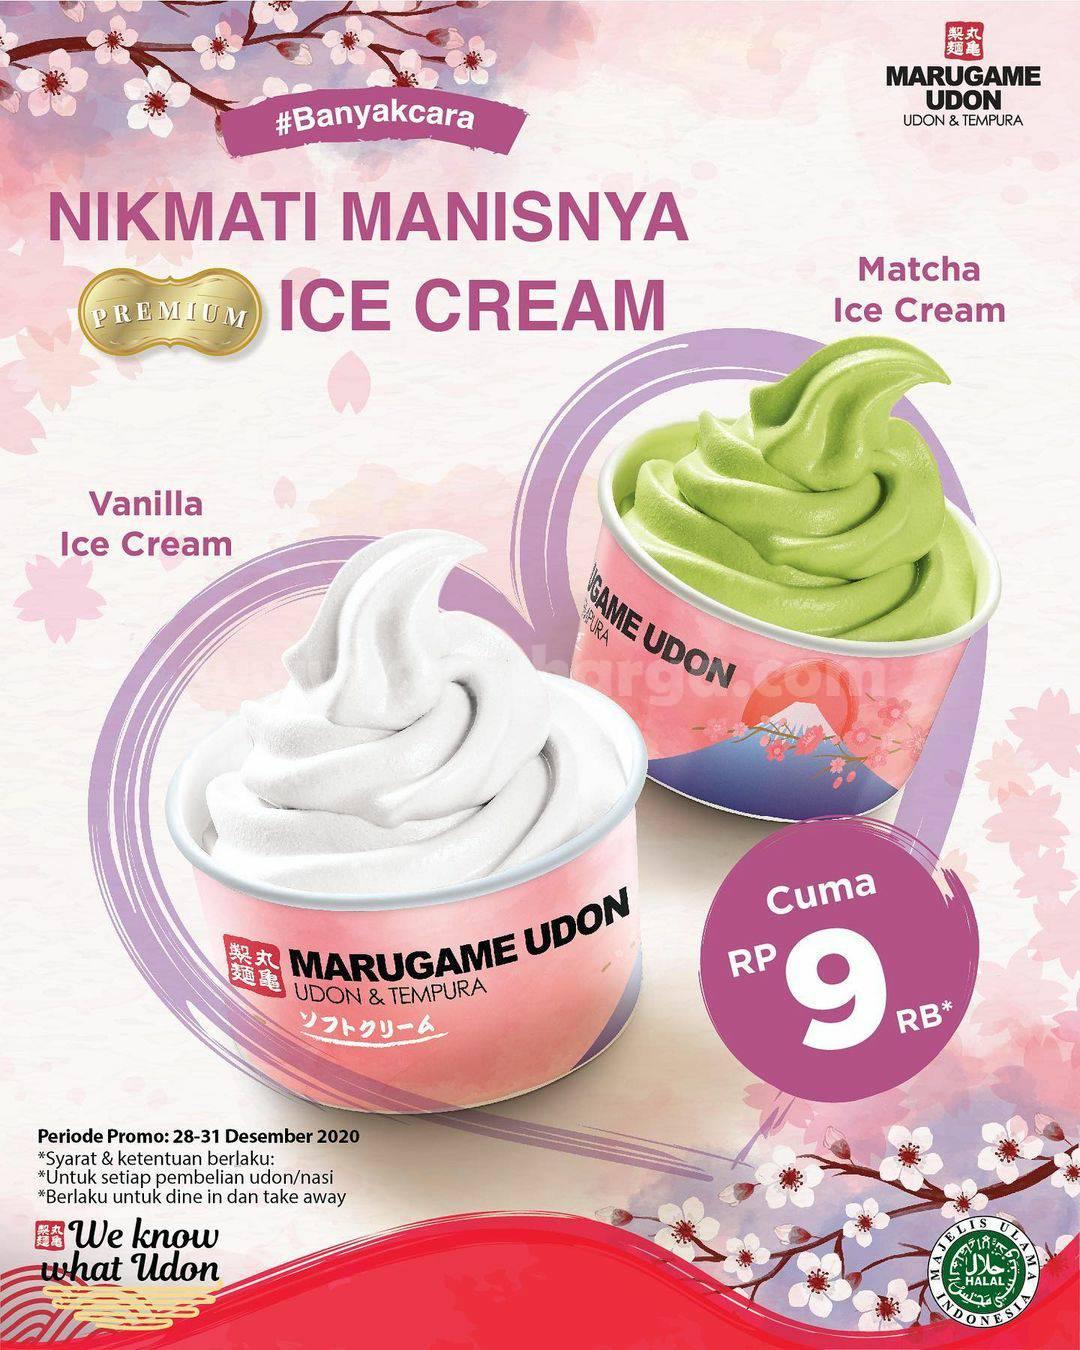 MARUGAME UDON Promo Spesial Premium Ice Cream harga hanya Rp. 9.000